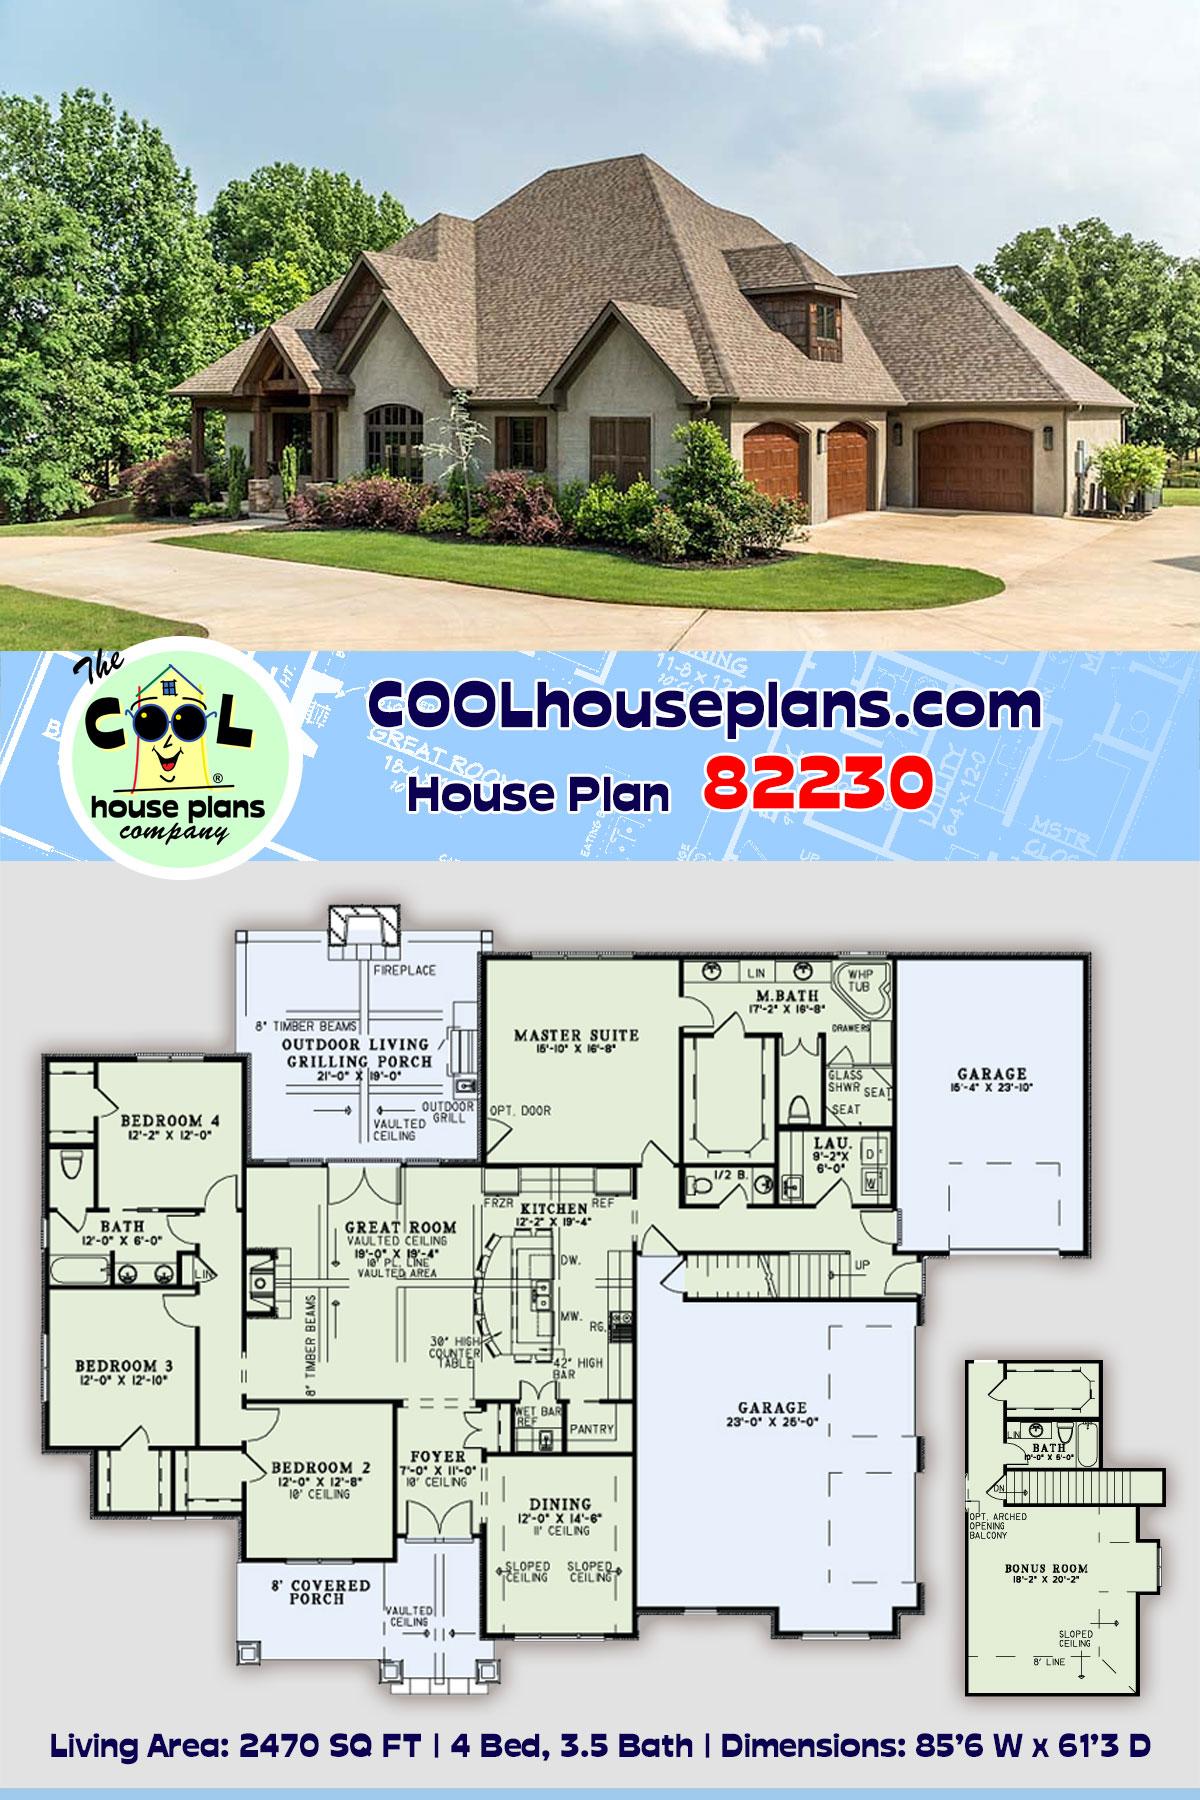 Craftsman, European House Plan 82230 with 4 Beds, 4 Baths, 3 Car Garage